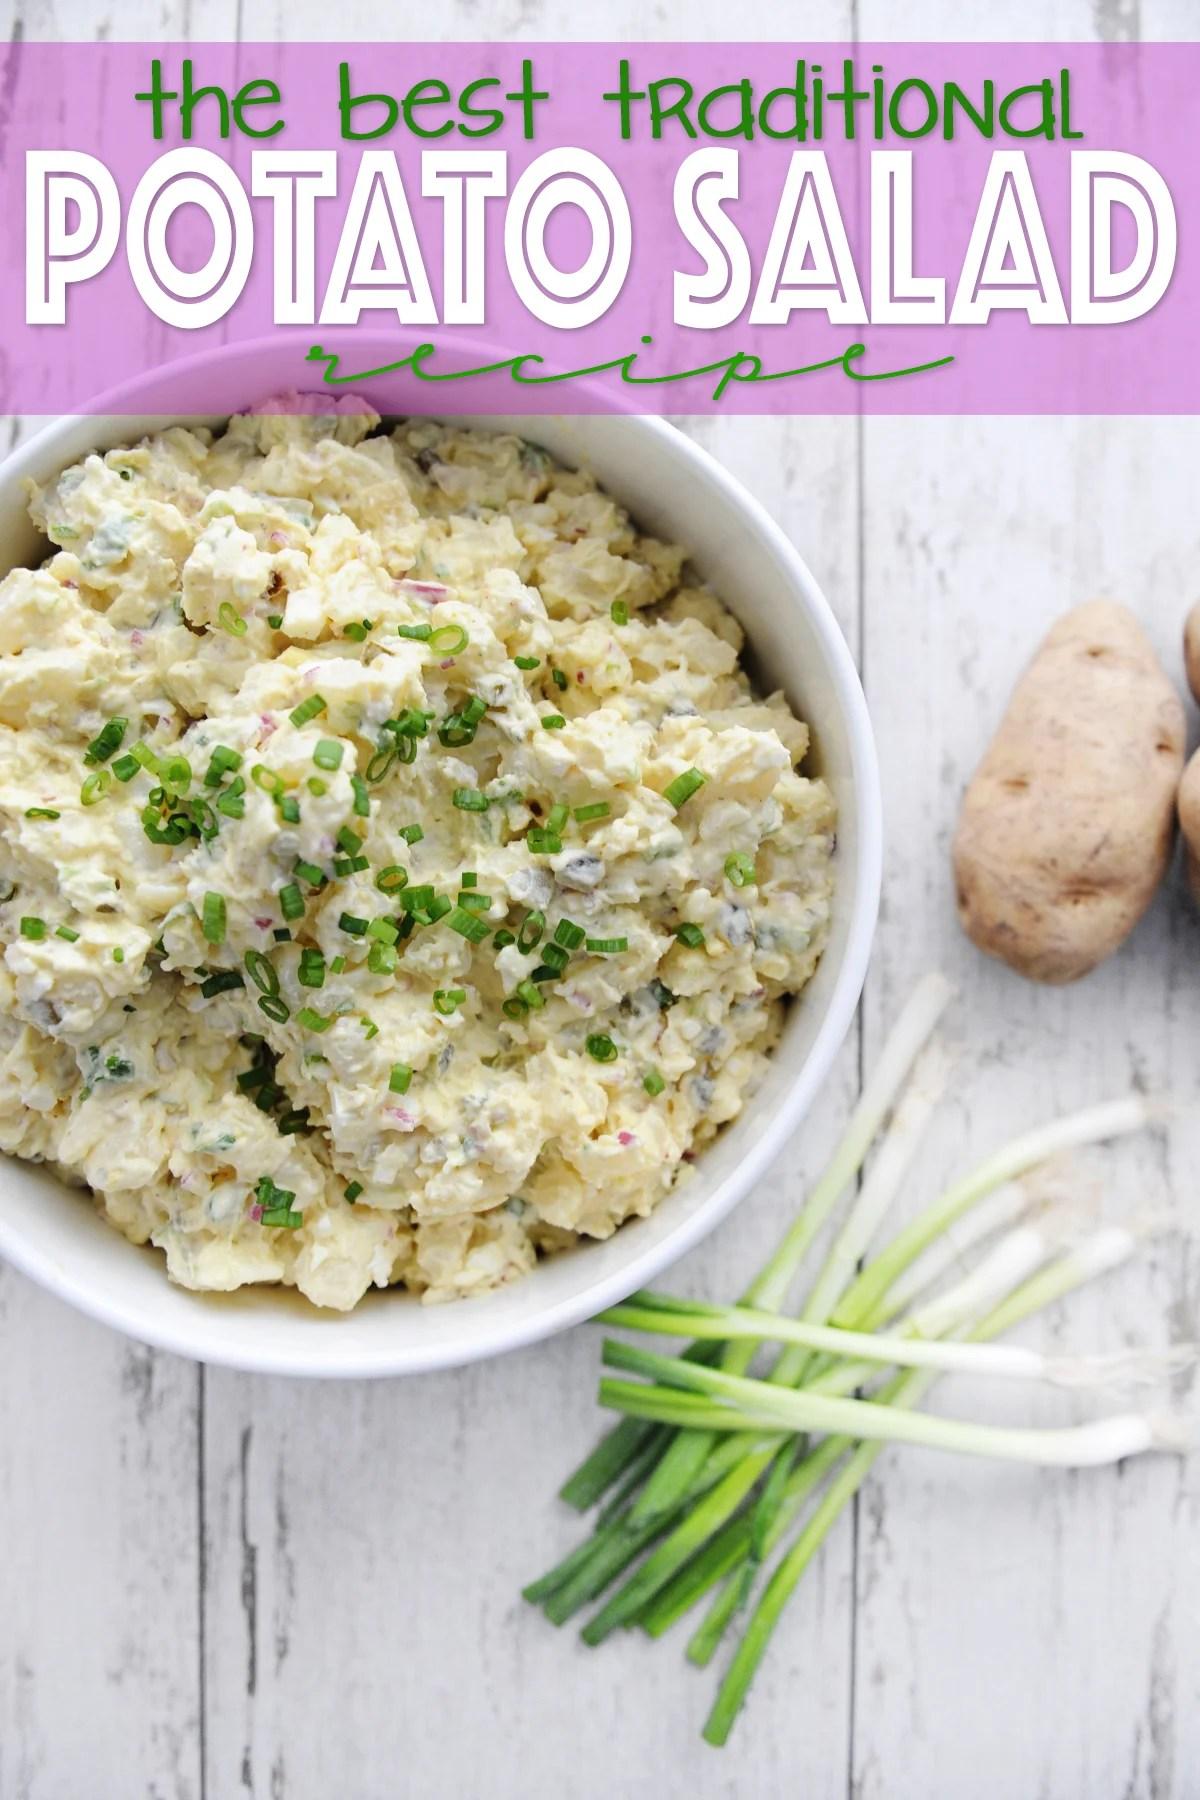 the best traditional potato salad recipe